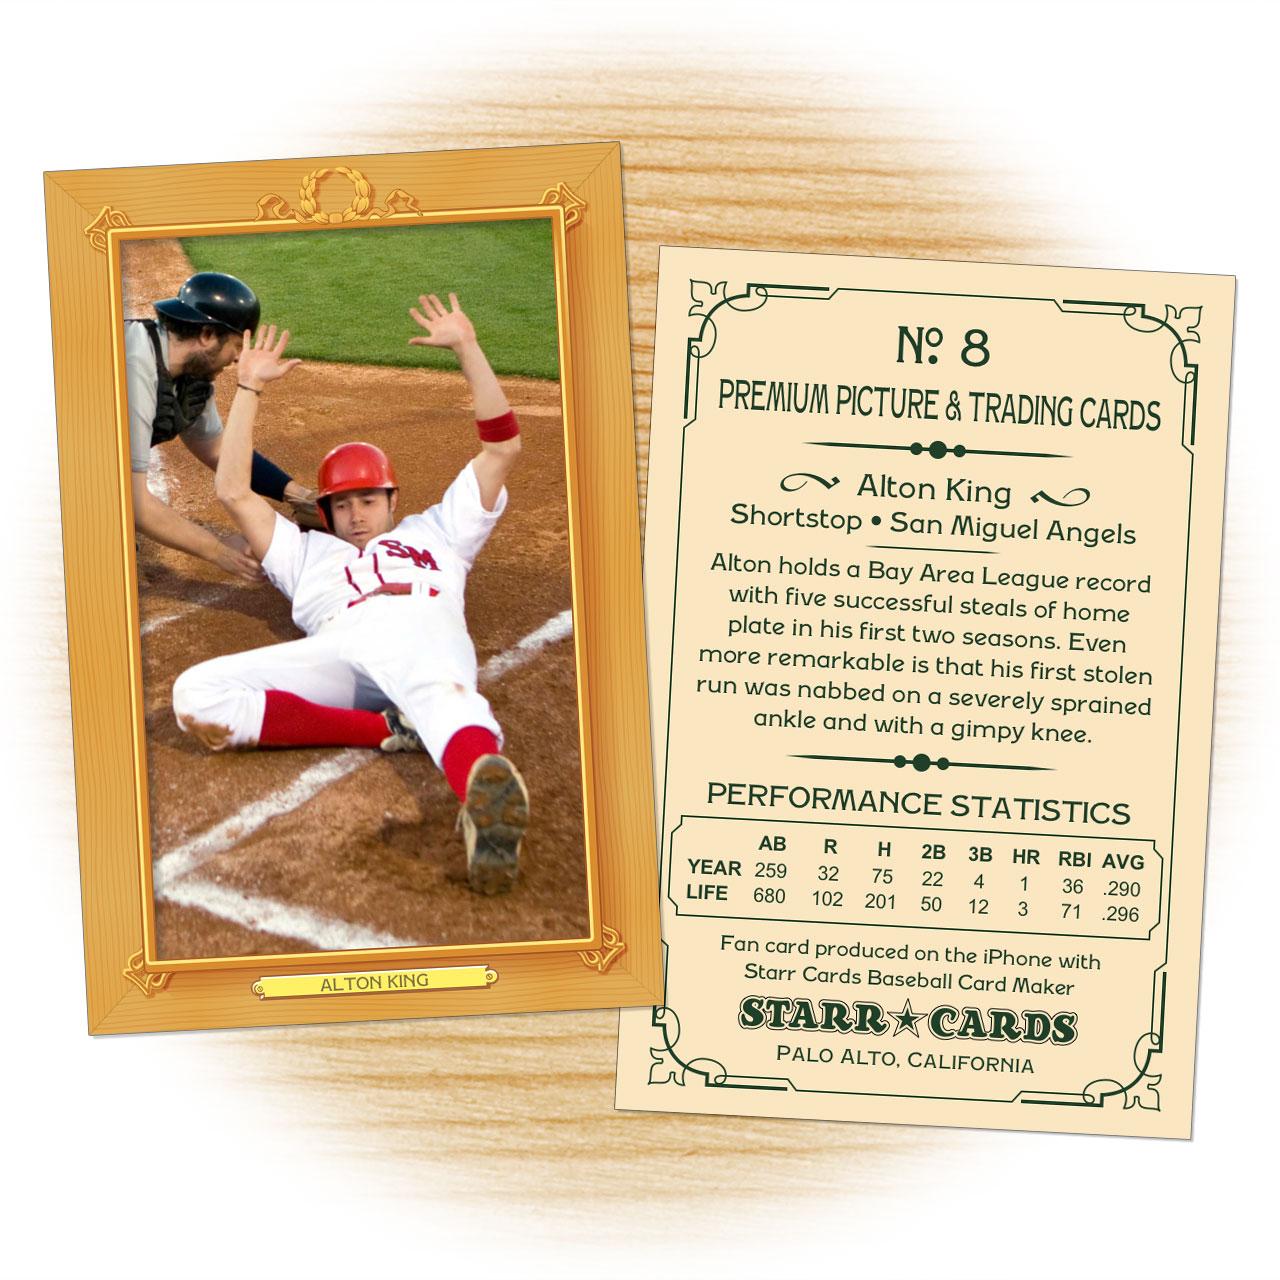 Custom Baseball Cards - Vintage 11™ Series Starr Cards